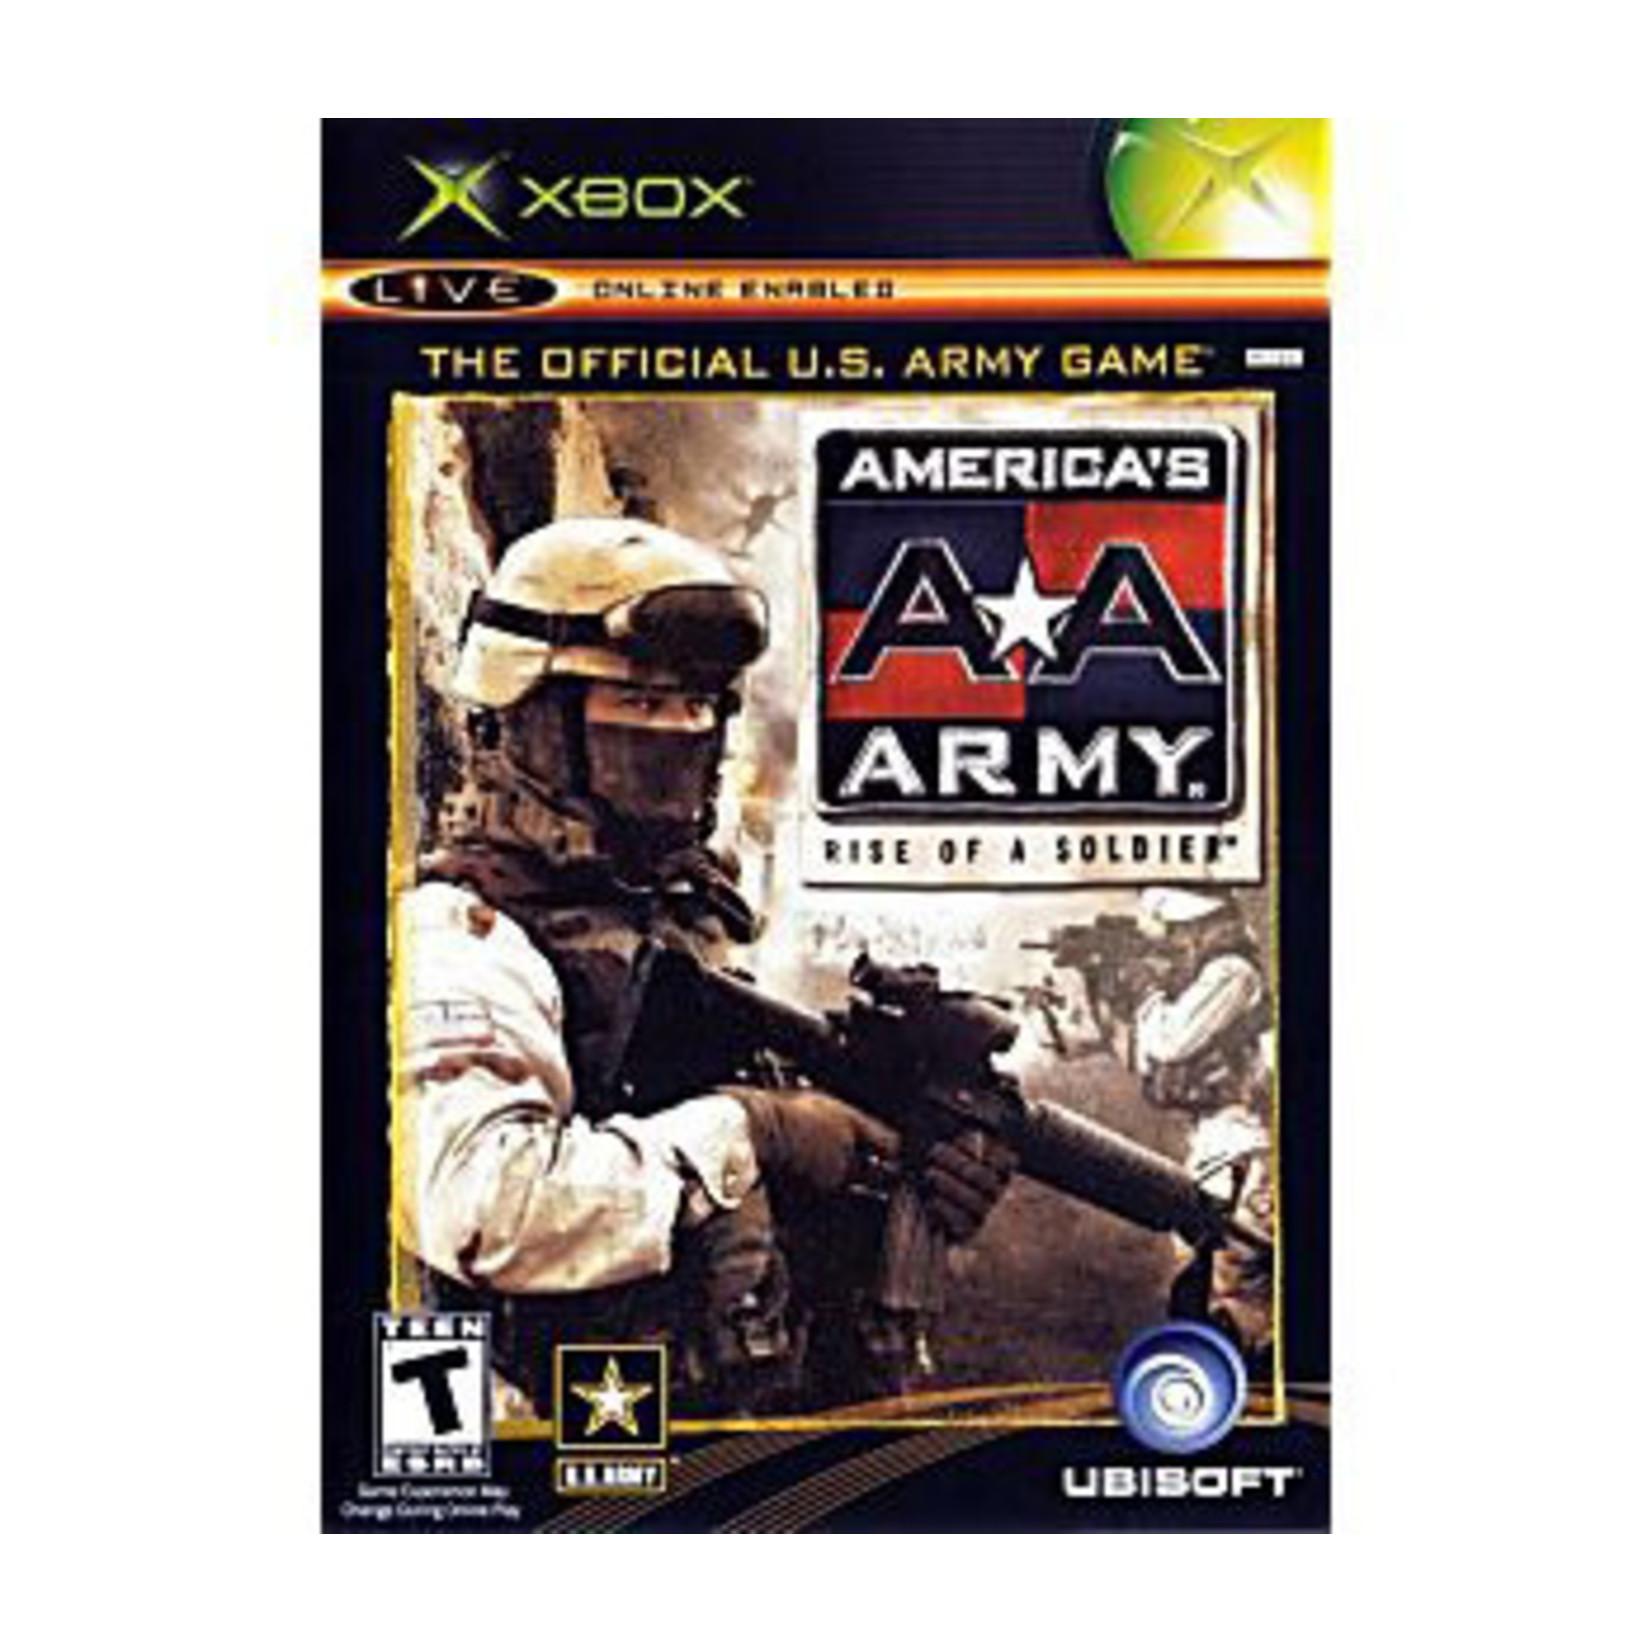 XBU-AMERICAS ARMY RISE OF A SOLDIER